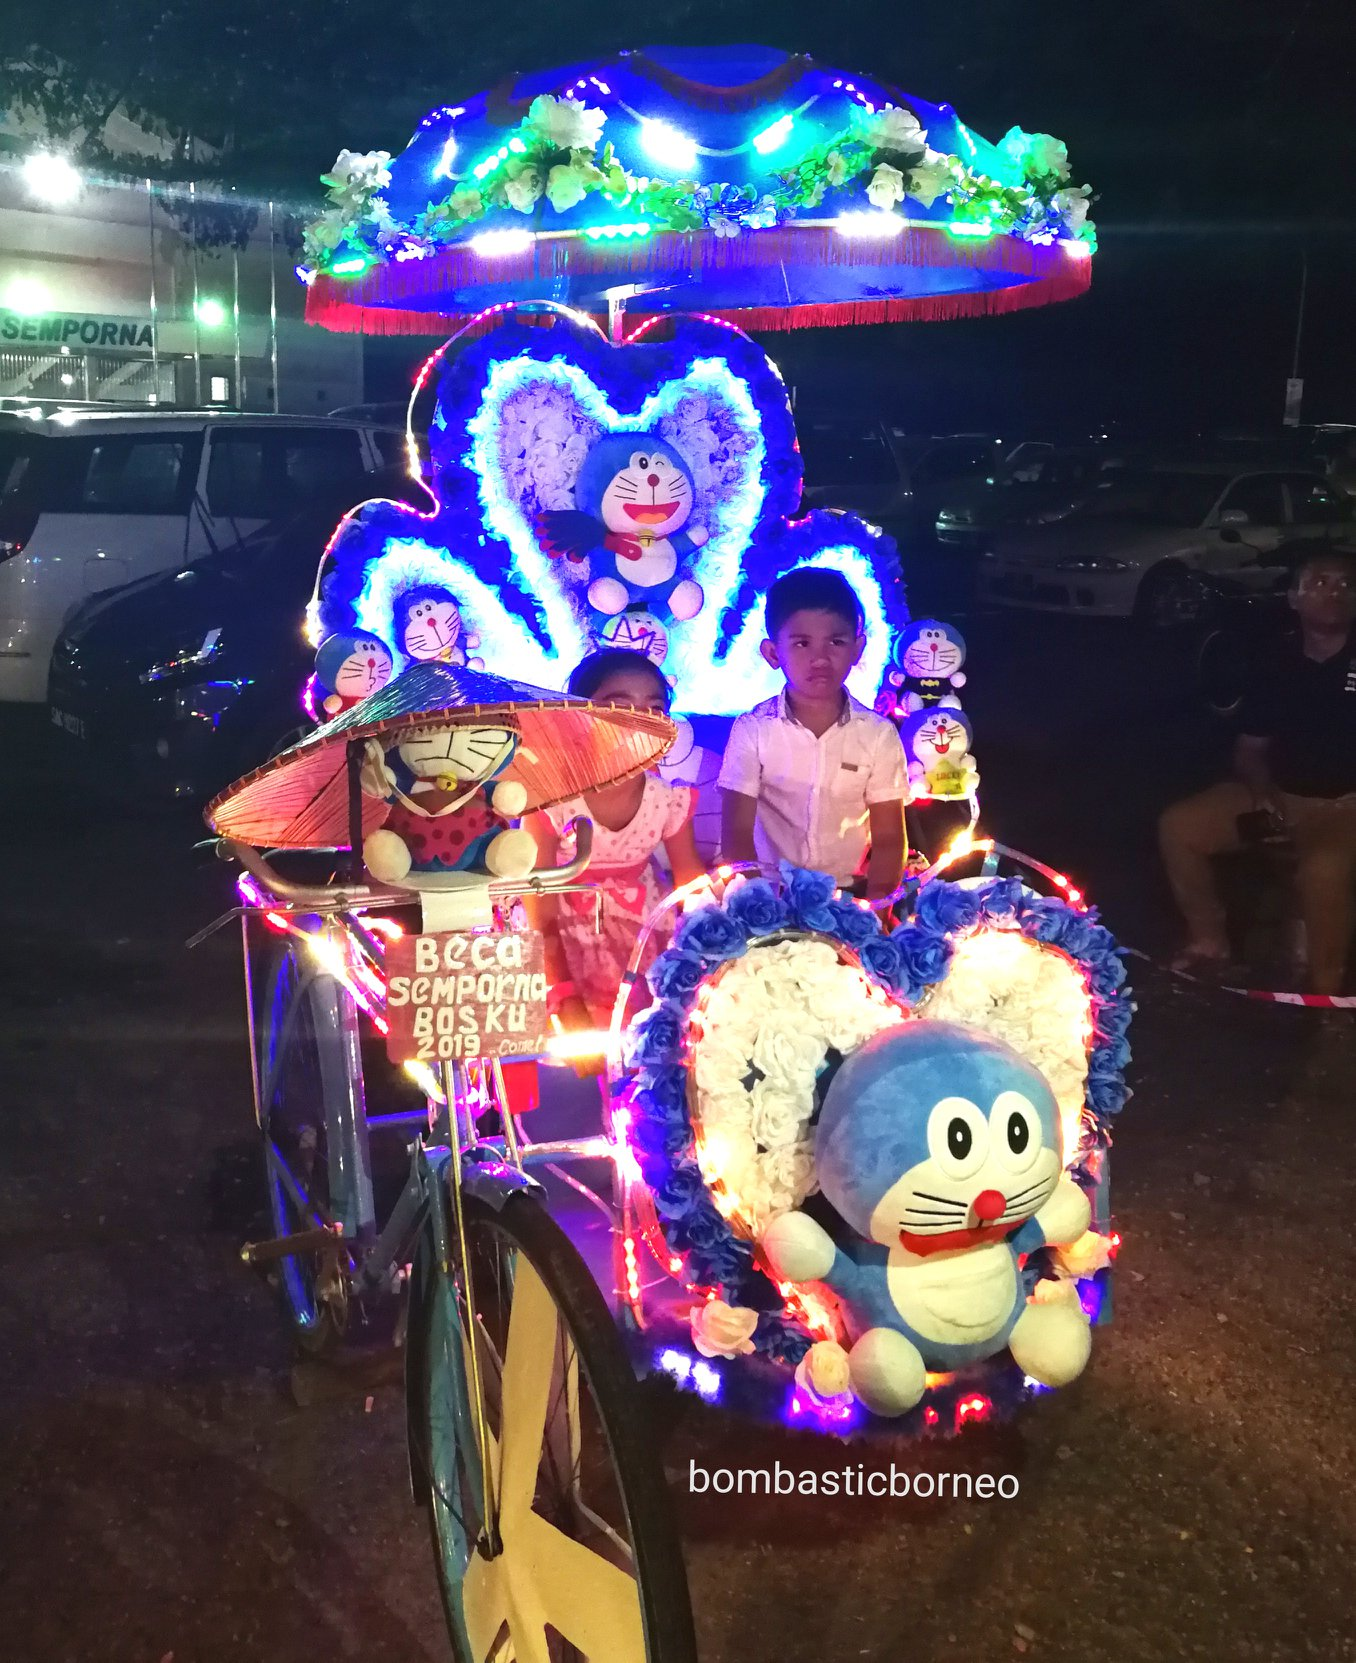 Pesta Regatta Lepa, Water Festival, backpackers, destination, Tourism, travel guide, 探索婆罗洲马来西亚, 沙巴仙本那